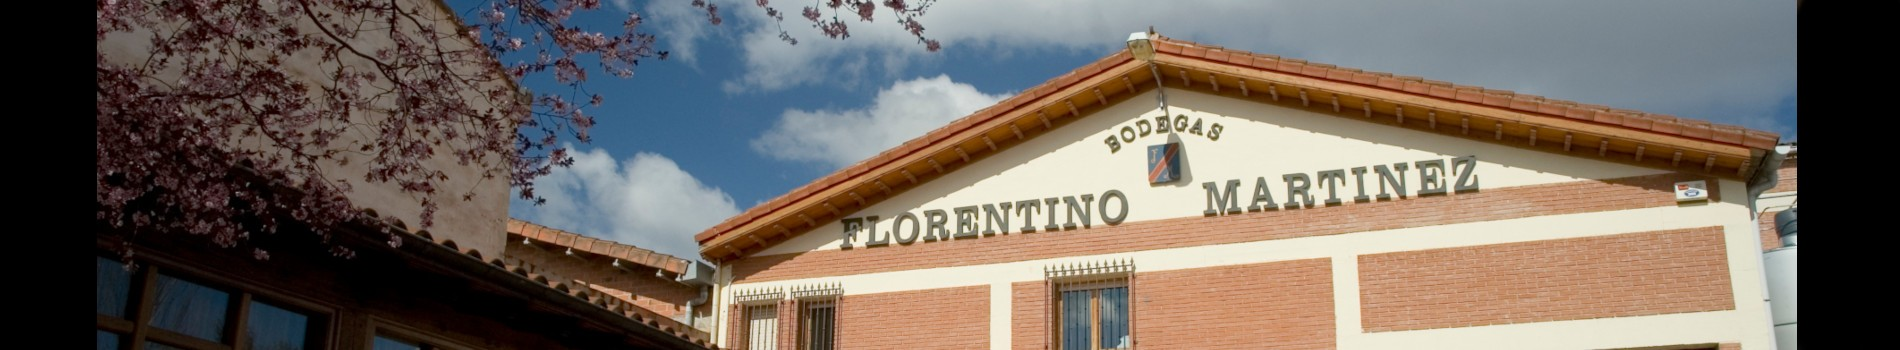 Bodega-Florentino-Martinez